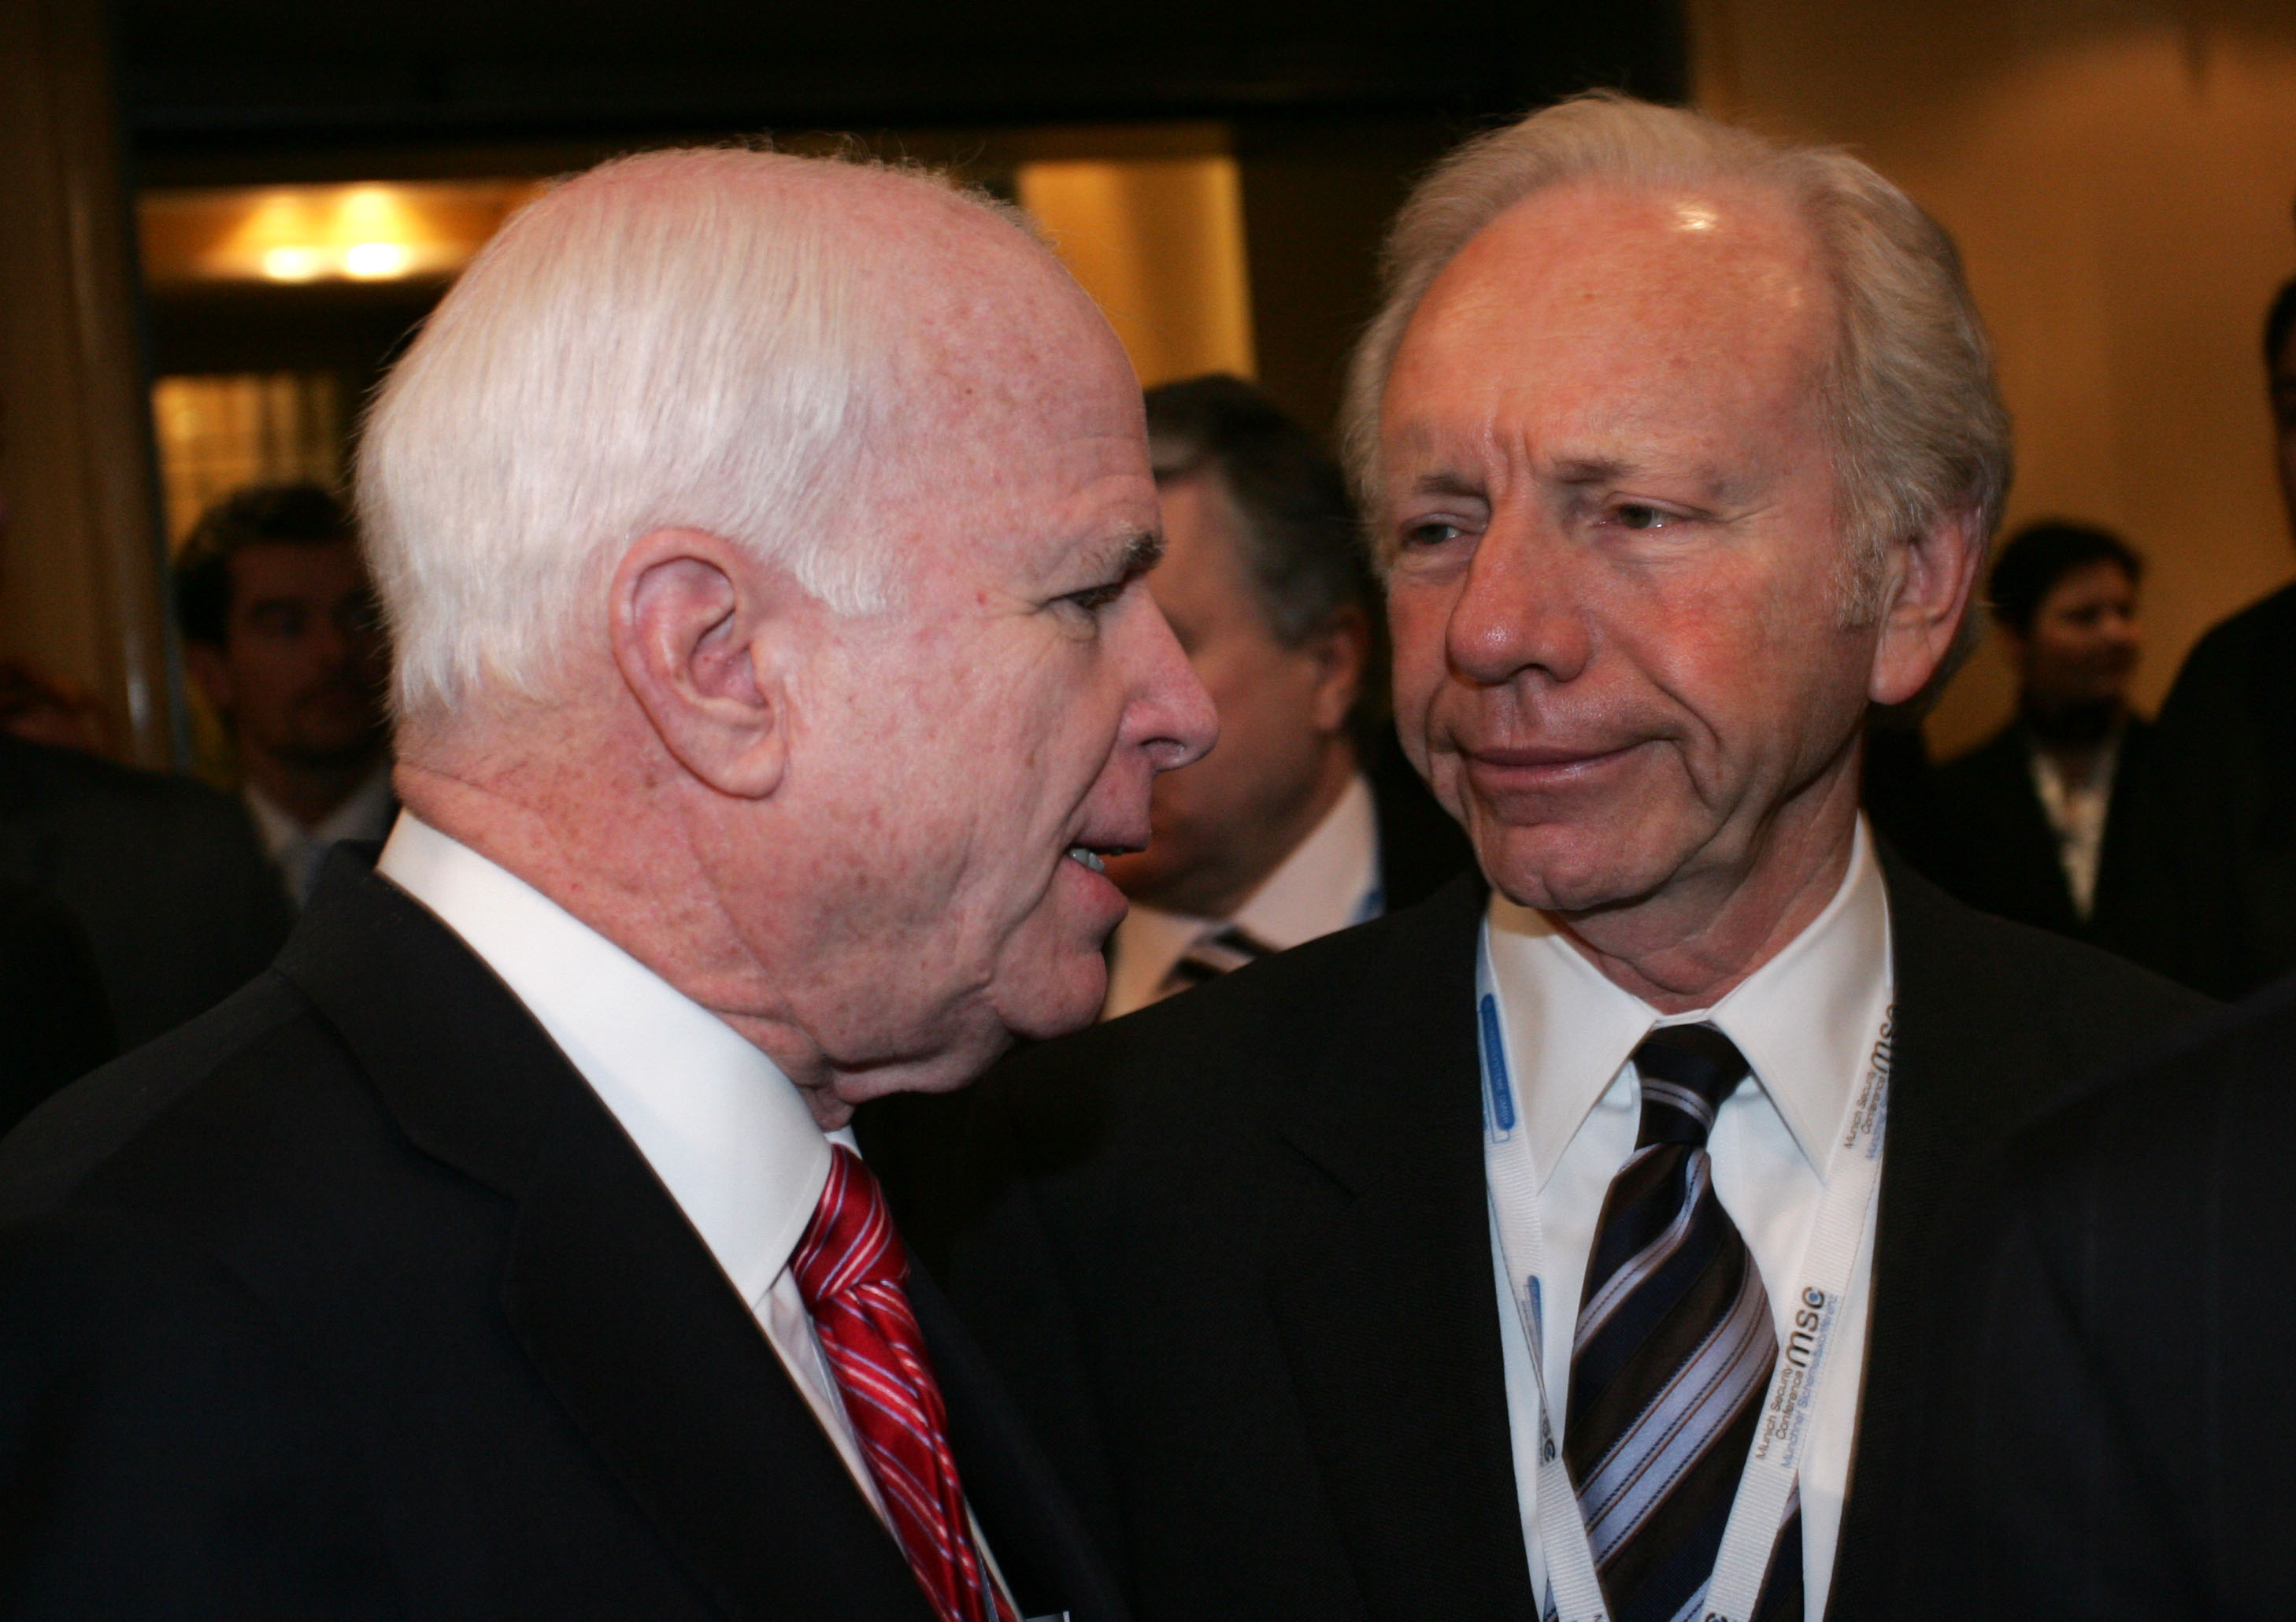 McCain with fellow Senator Joe Lieberman in 2010